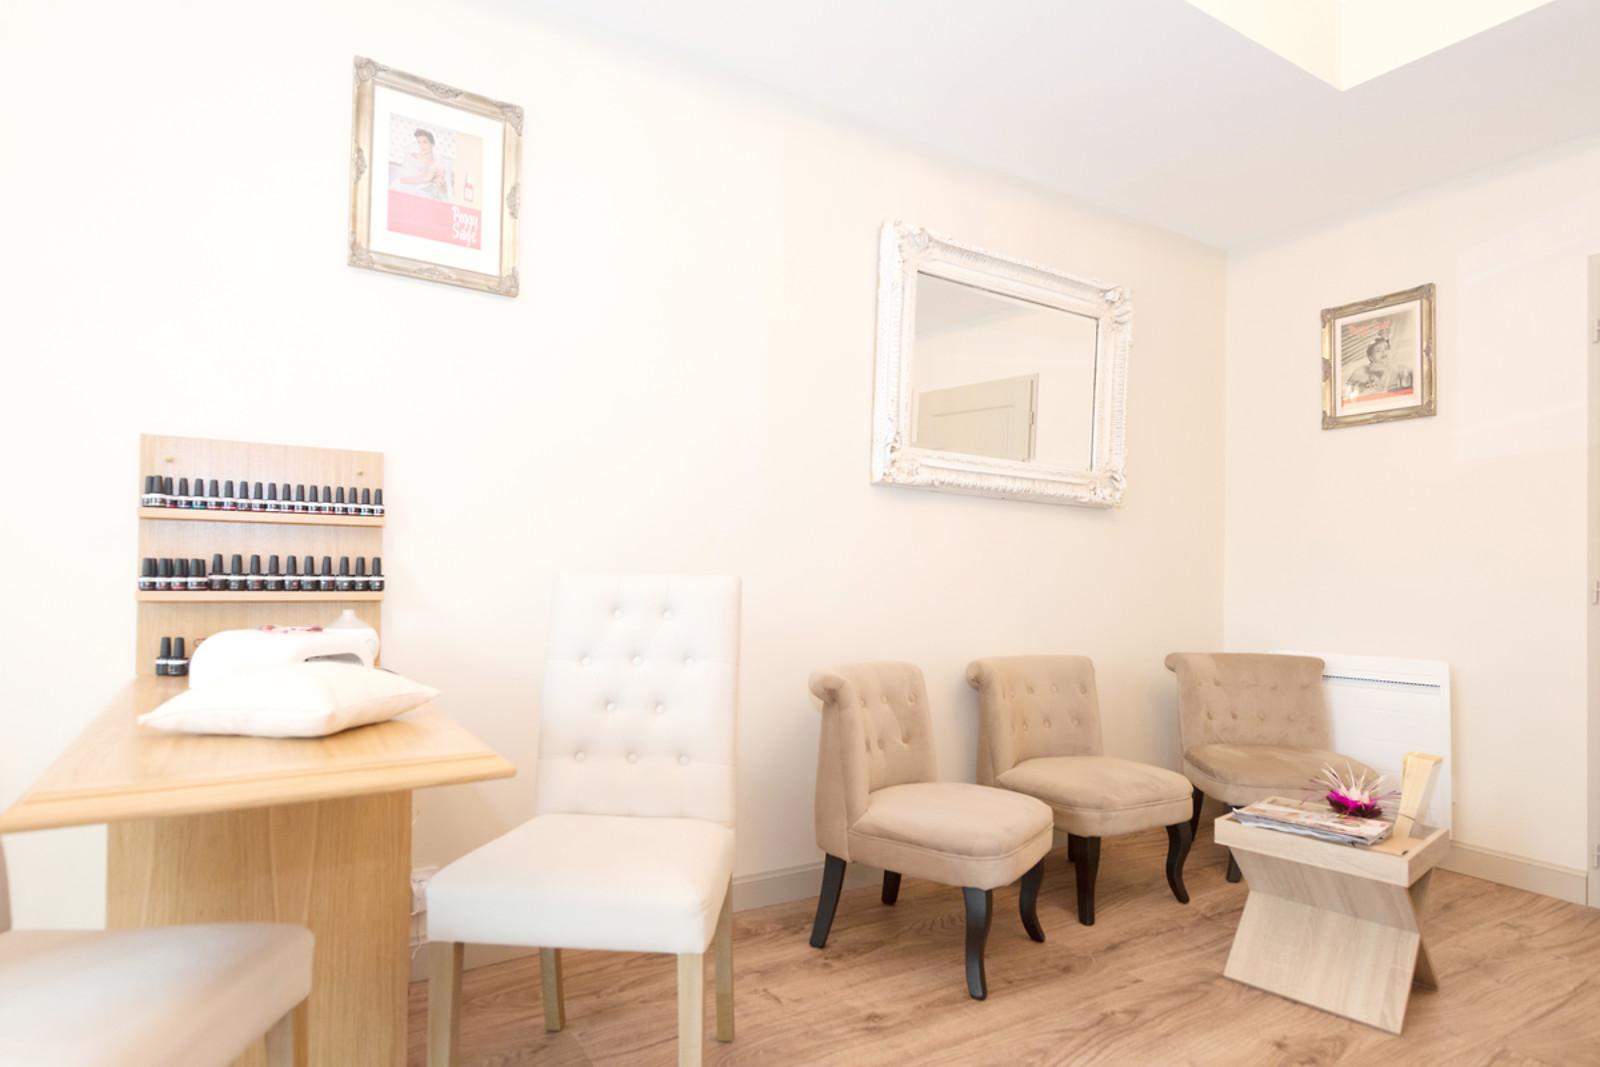 modelage l 39 institut beaut virginie mignaloux beauvoir 86 wonderbox. Black Bedroom Furniture Sets. Home Design Ideas